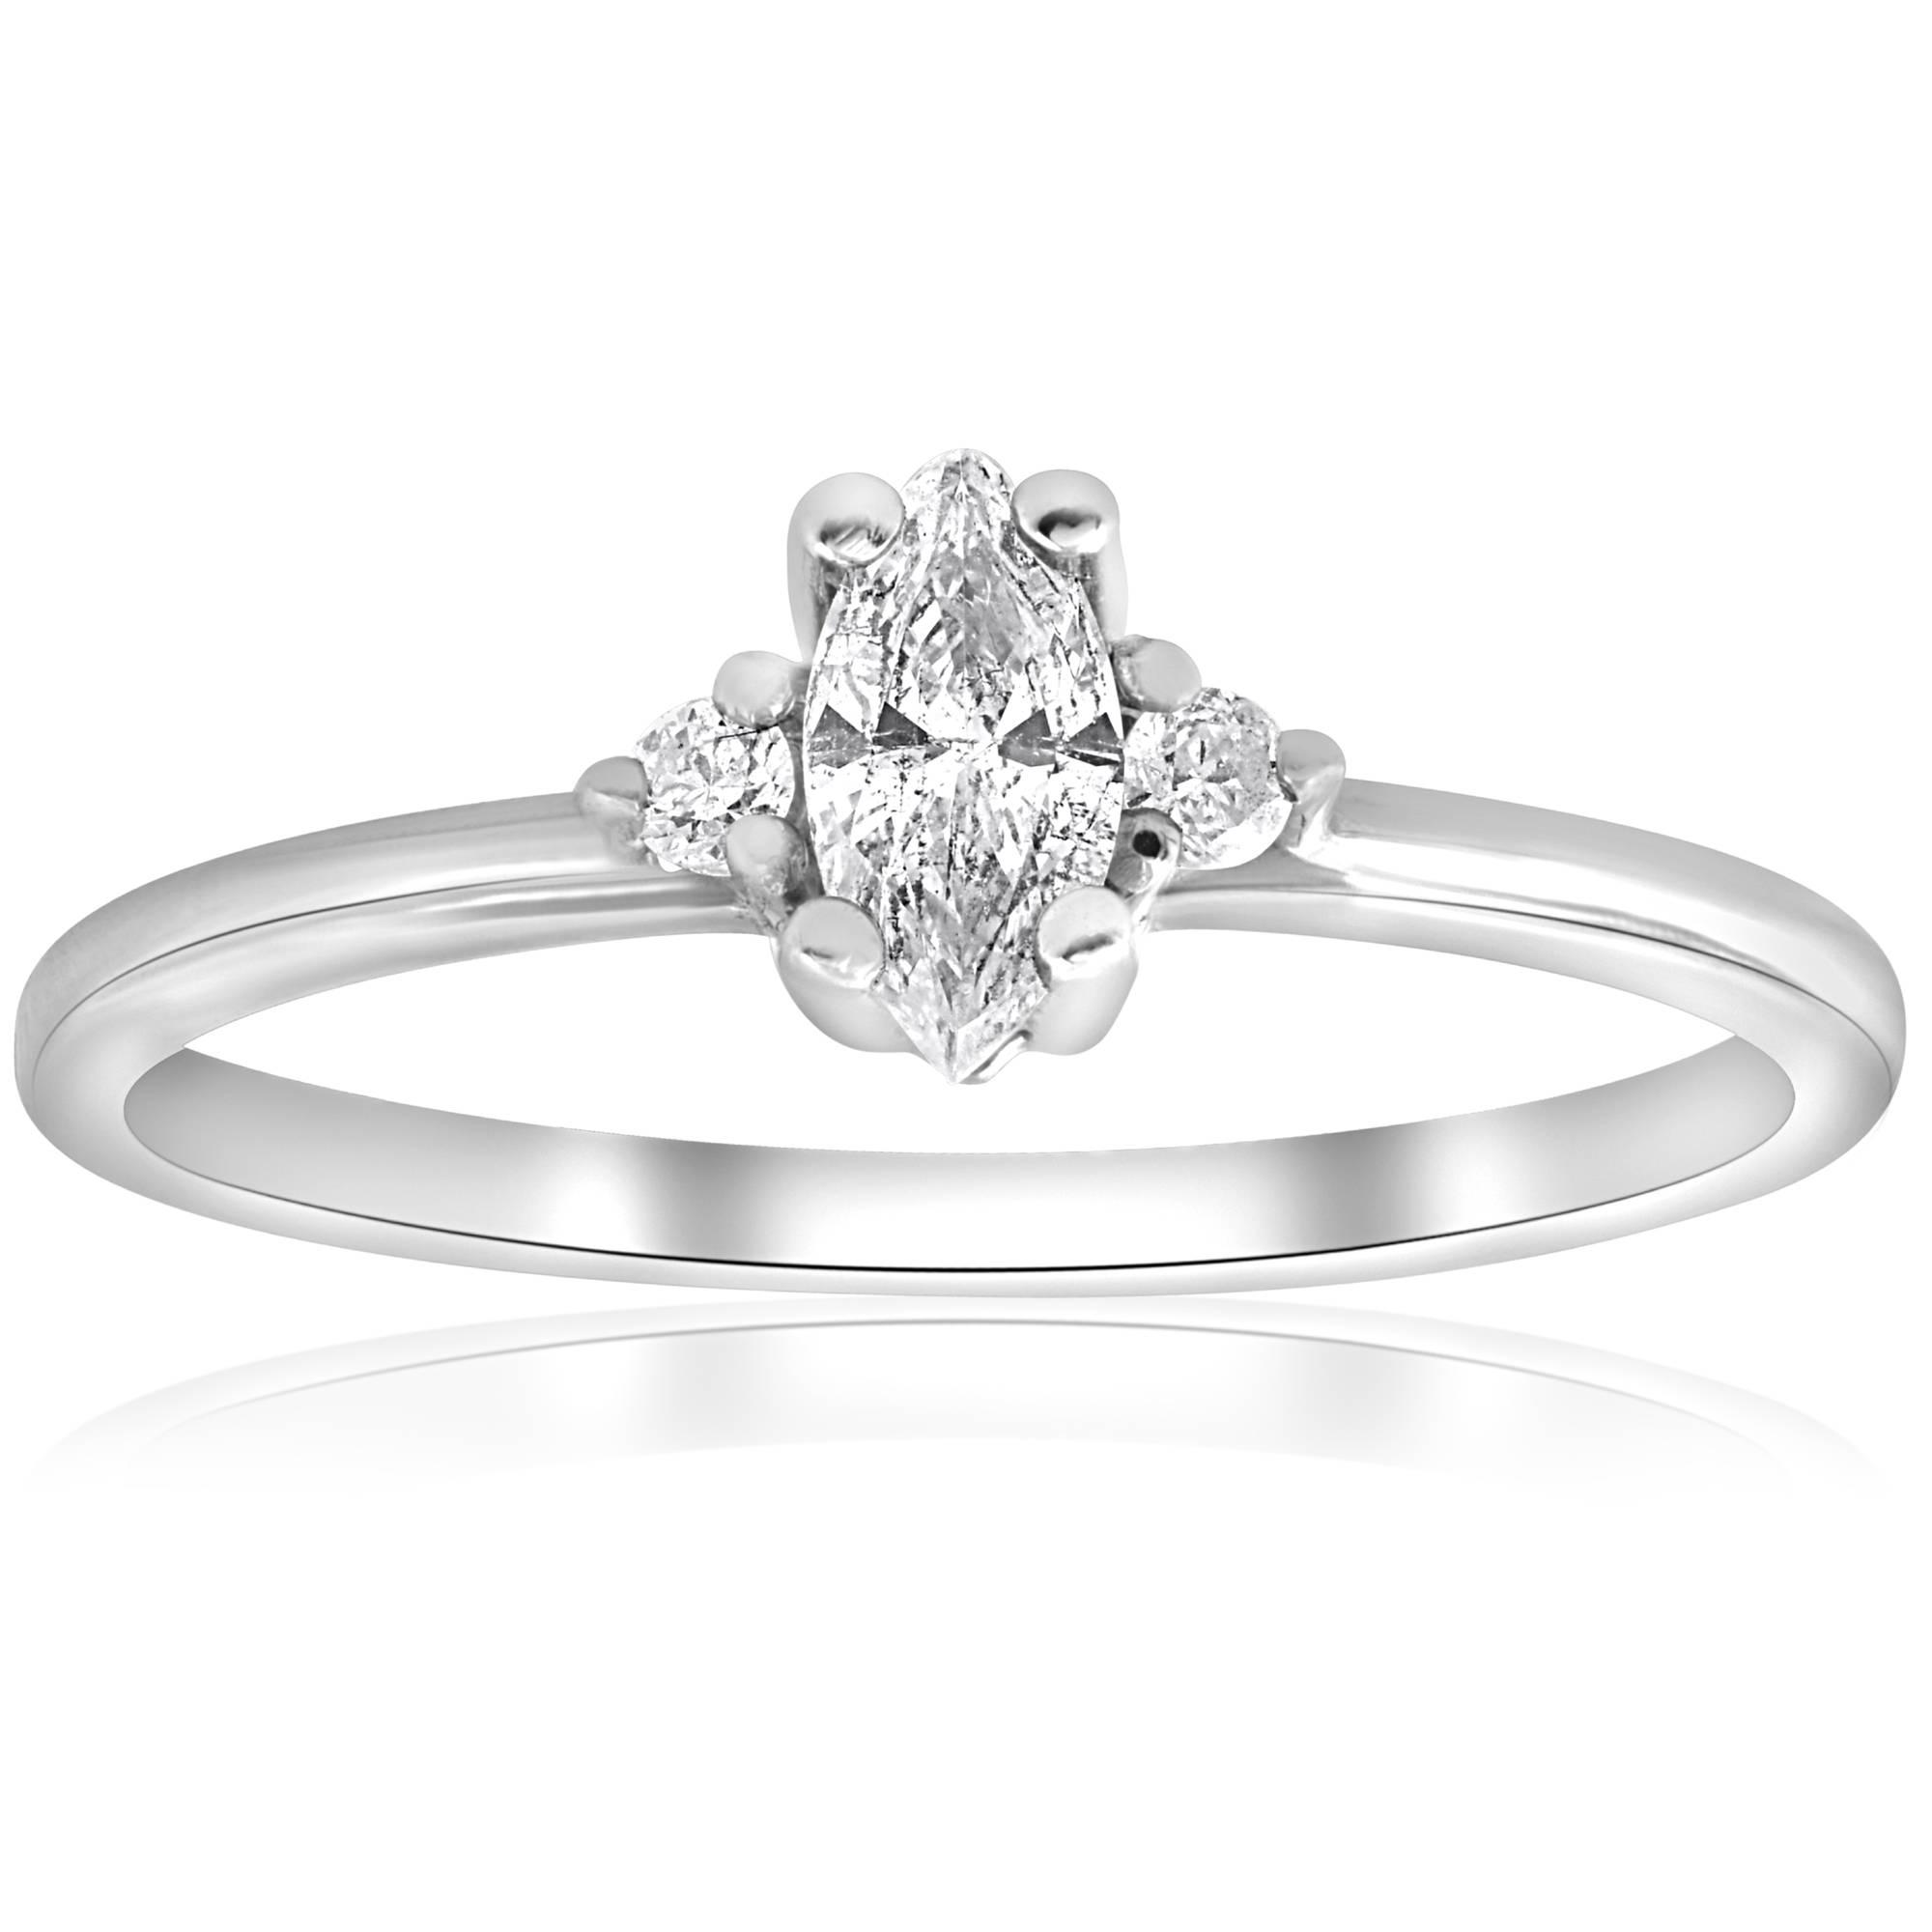 Marquise Diamond Three Stone Engagement Ring 13 Ct 10k. Harvard University Rings. Hand Wedding Rings. Johns Hopkins Rings. Giant Wedding Rings. Untraditional Engagement Rings. Small Flower Engagement Rings. Rapper Rings. Raw Rock Wedding Rings